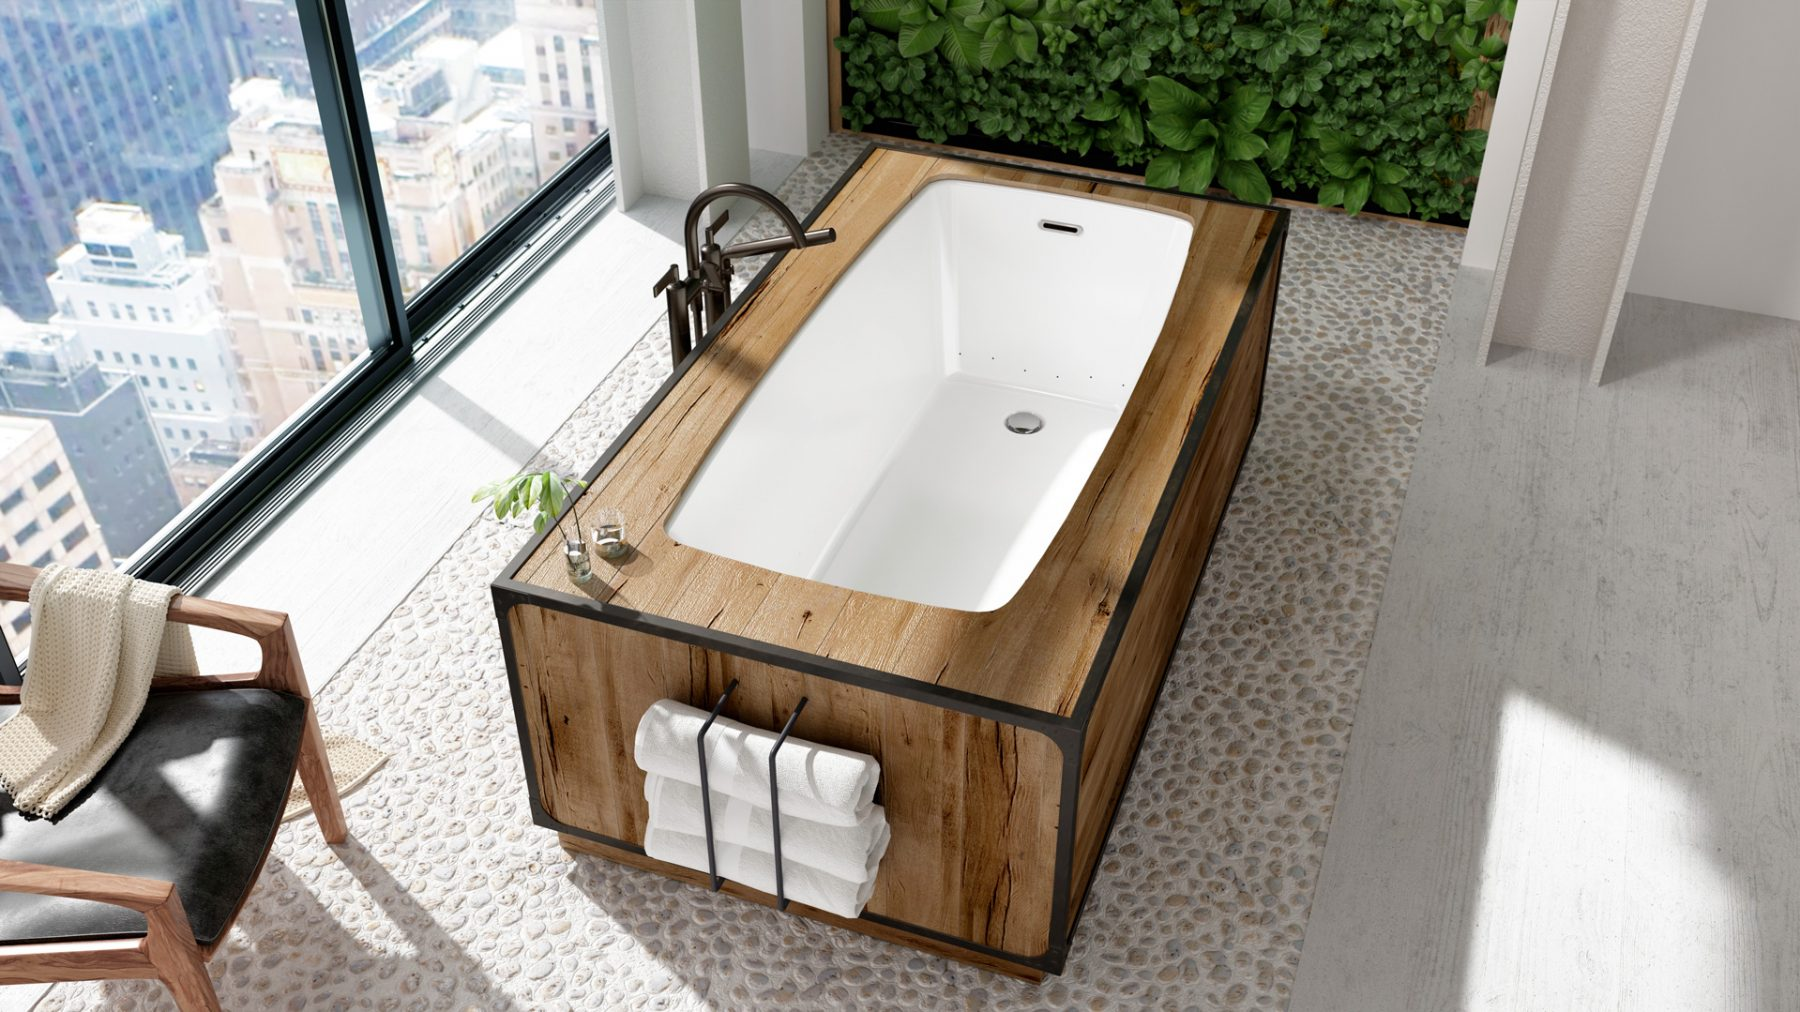 bain podium-3d-studio design-rendering-mur vegetal cgi